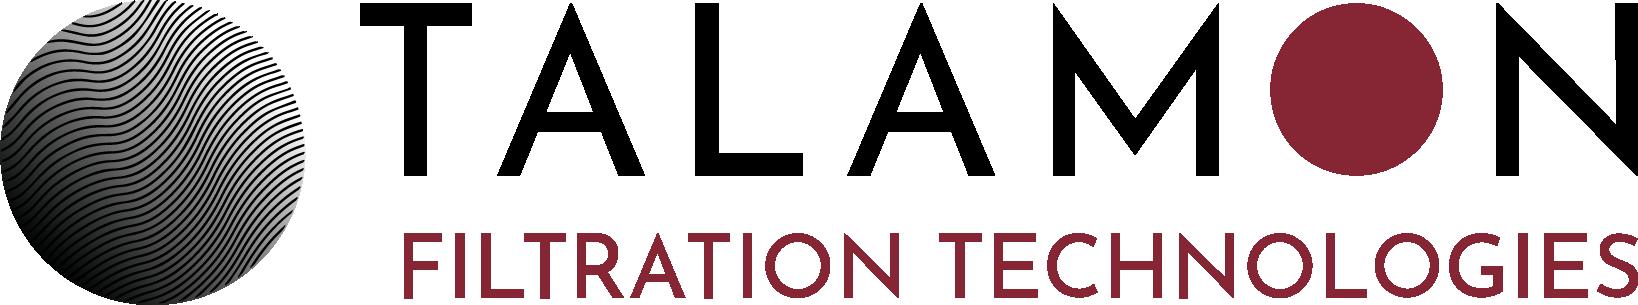 Talamon Filtration Technologies